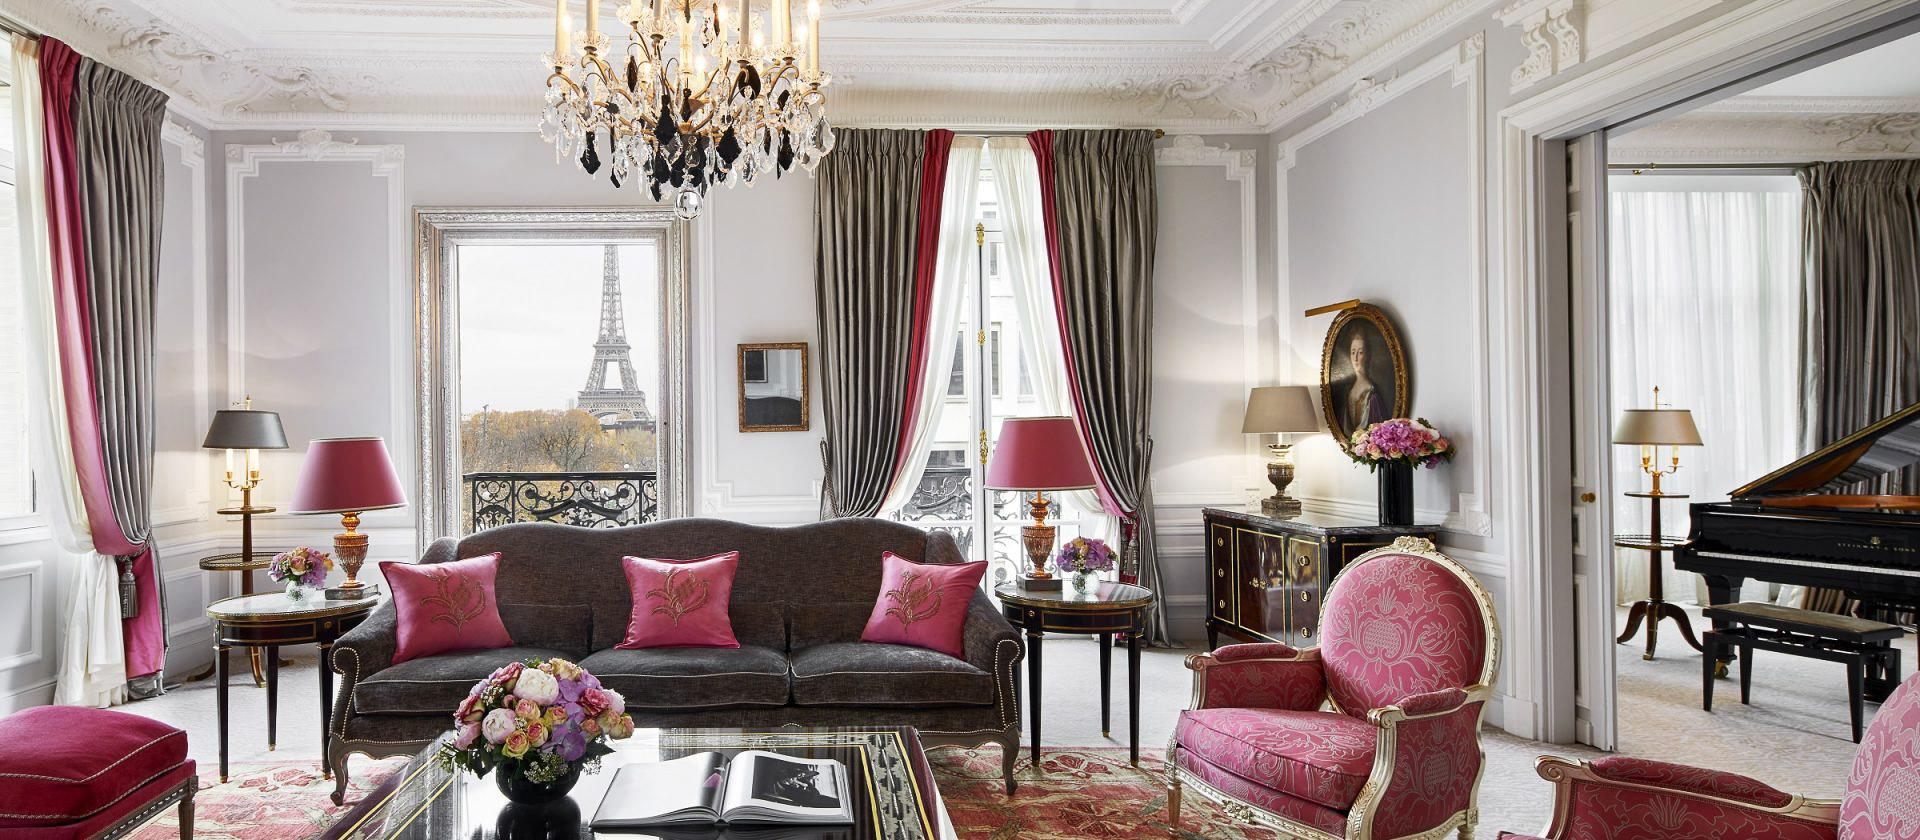 ckanani-Hotel Plaza Athenee9 Haute Couture suite.jpg